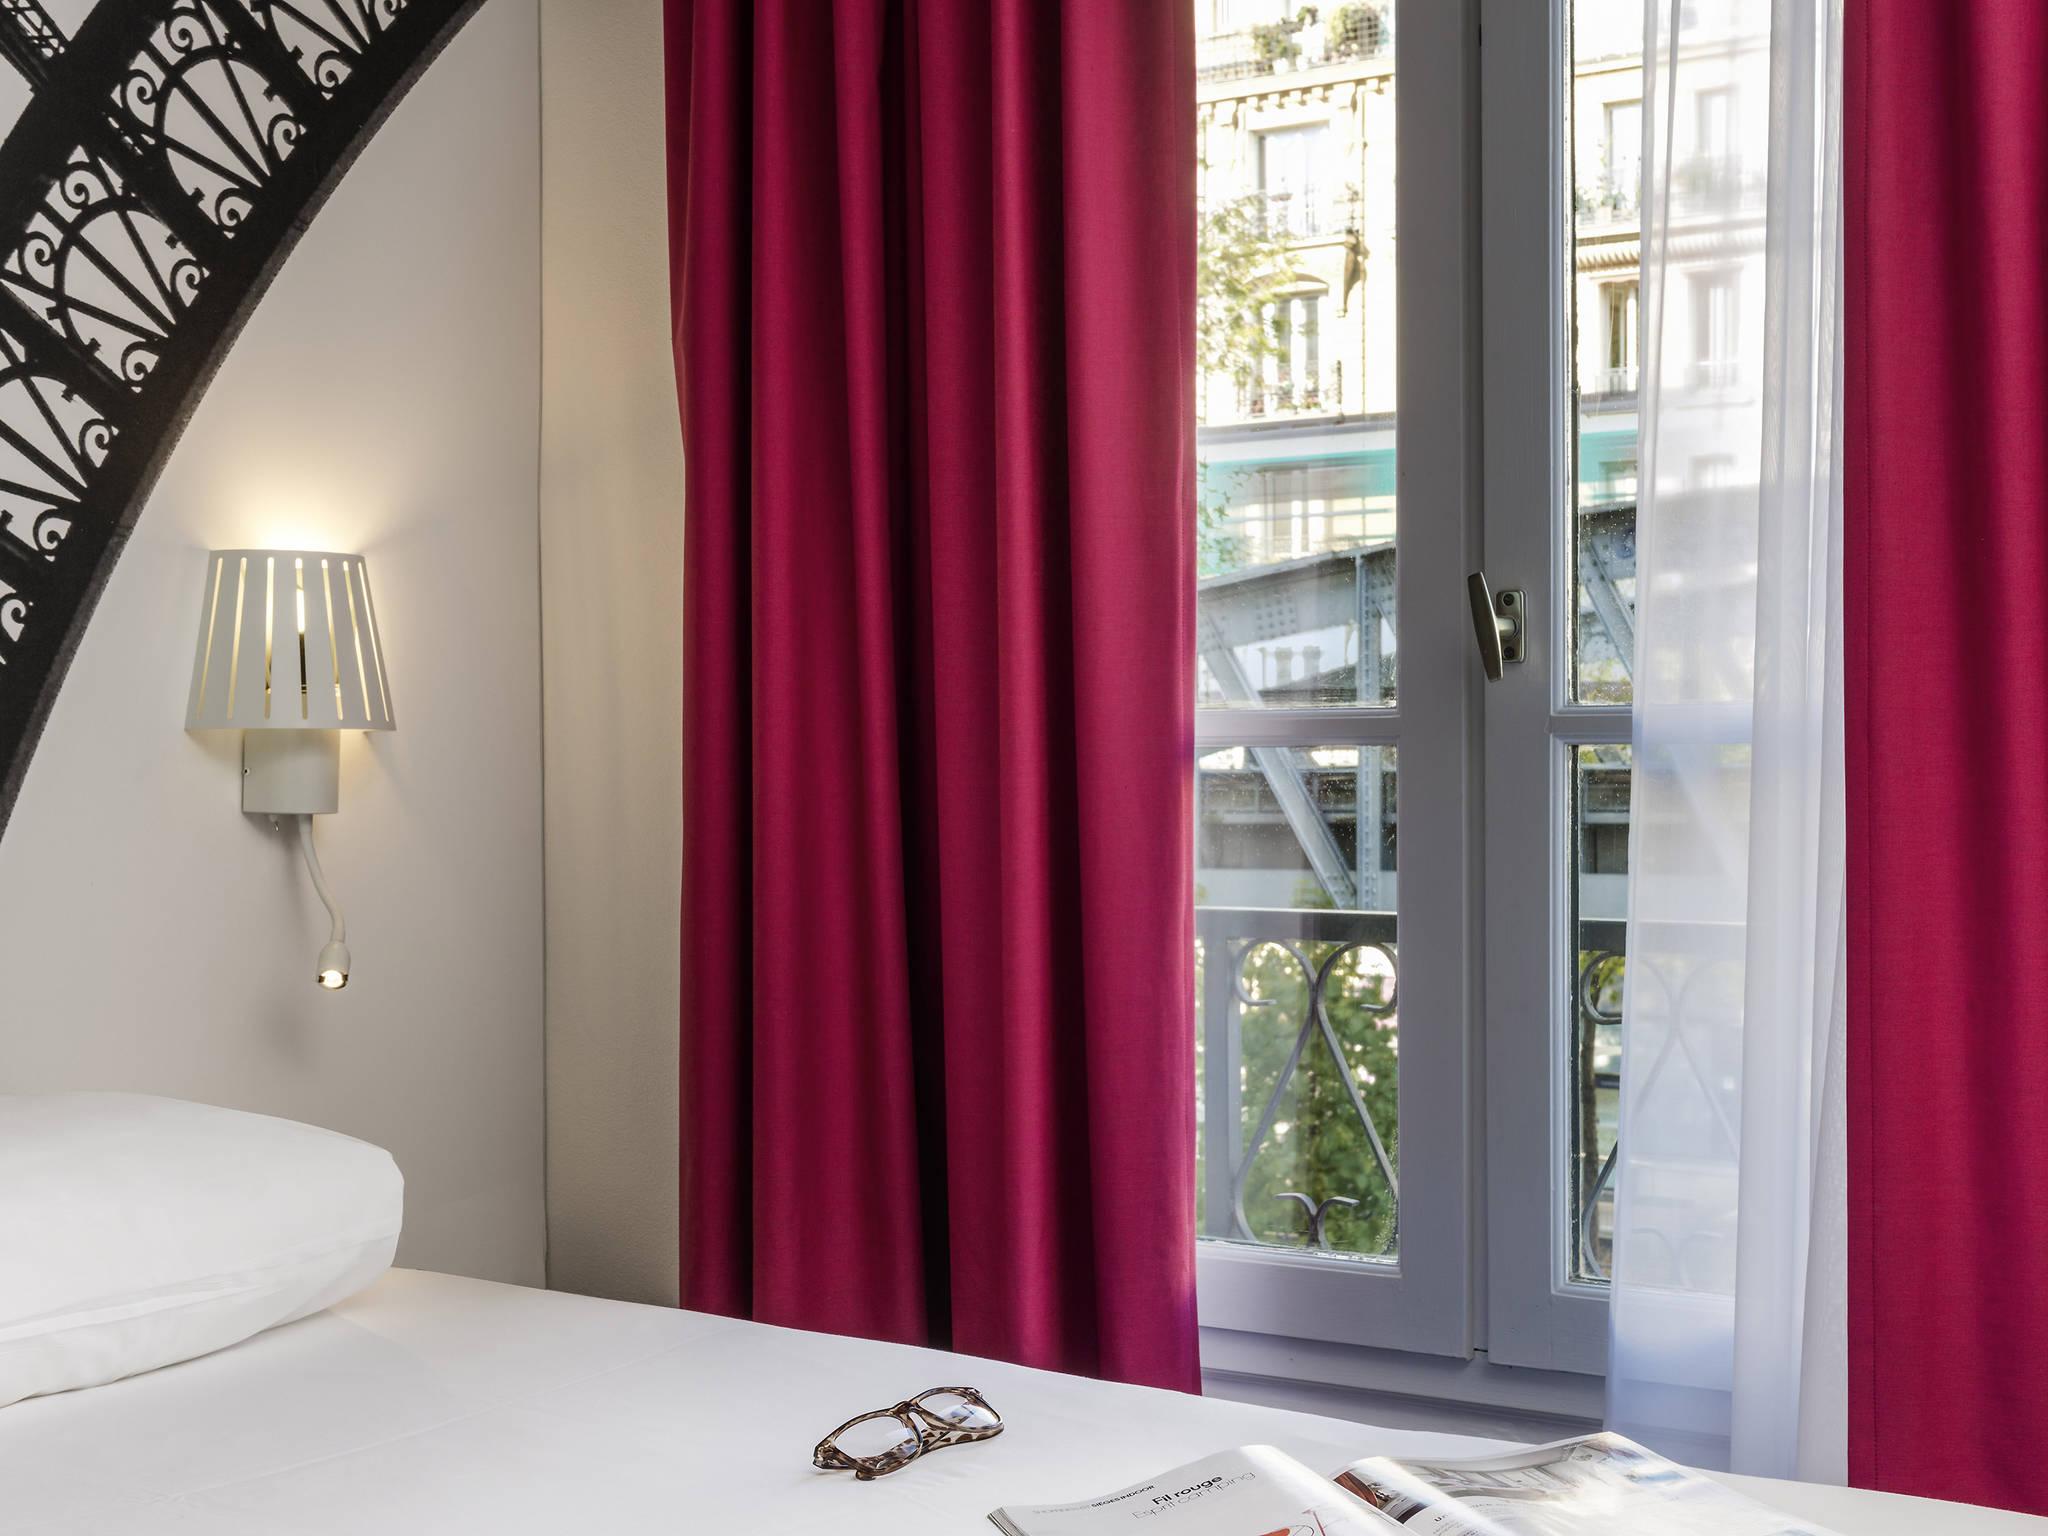 Otel – ibis Styles Paris Eiffel Cambronne